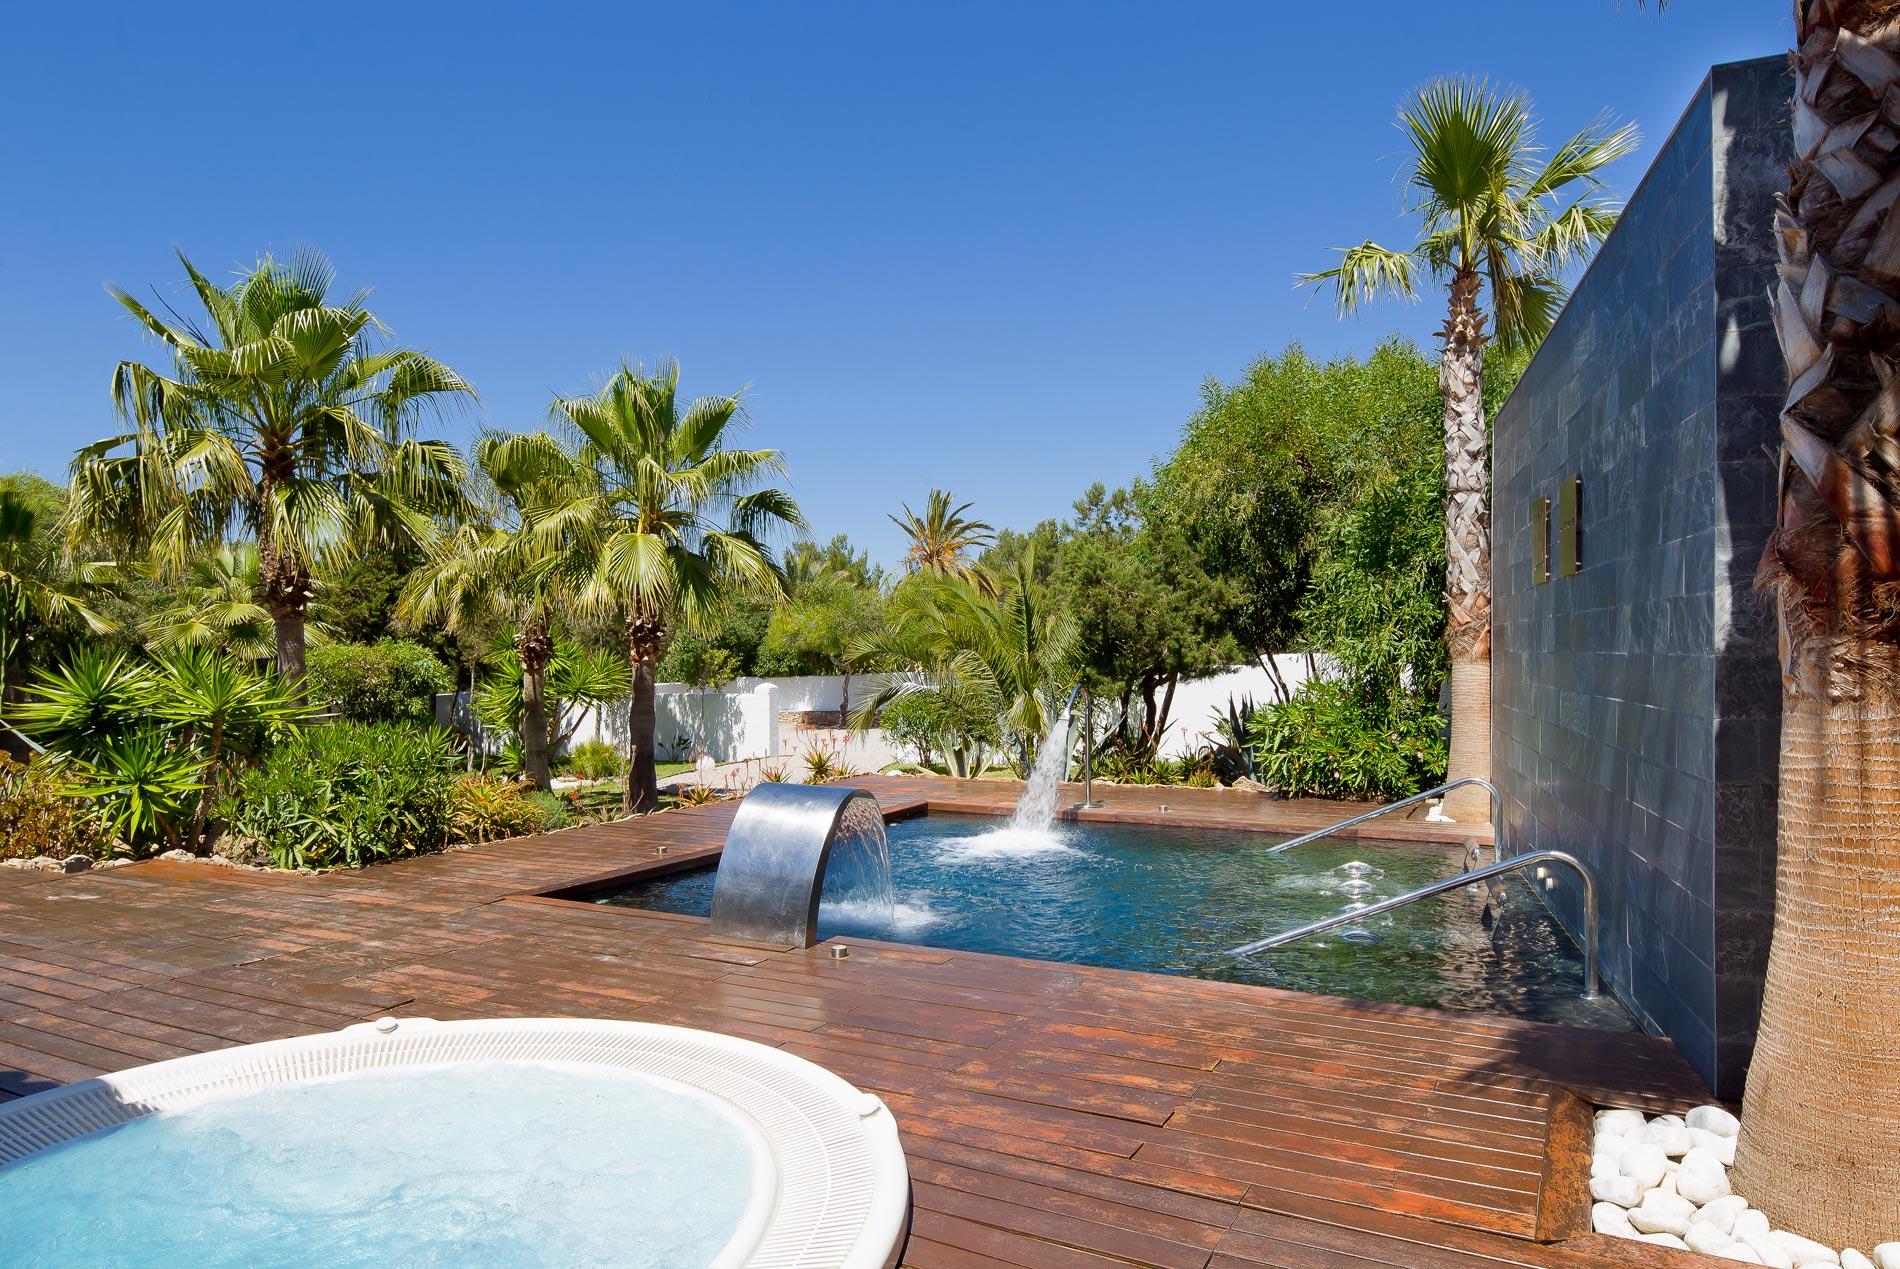 hotel de luxe design ibiza. Black Bedroom Furniture Sets. Home Design Ideas